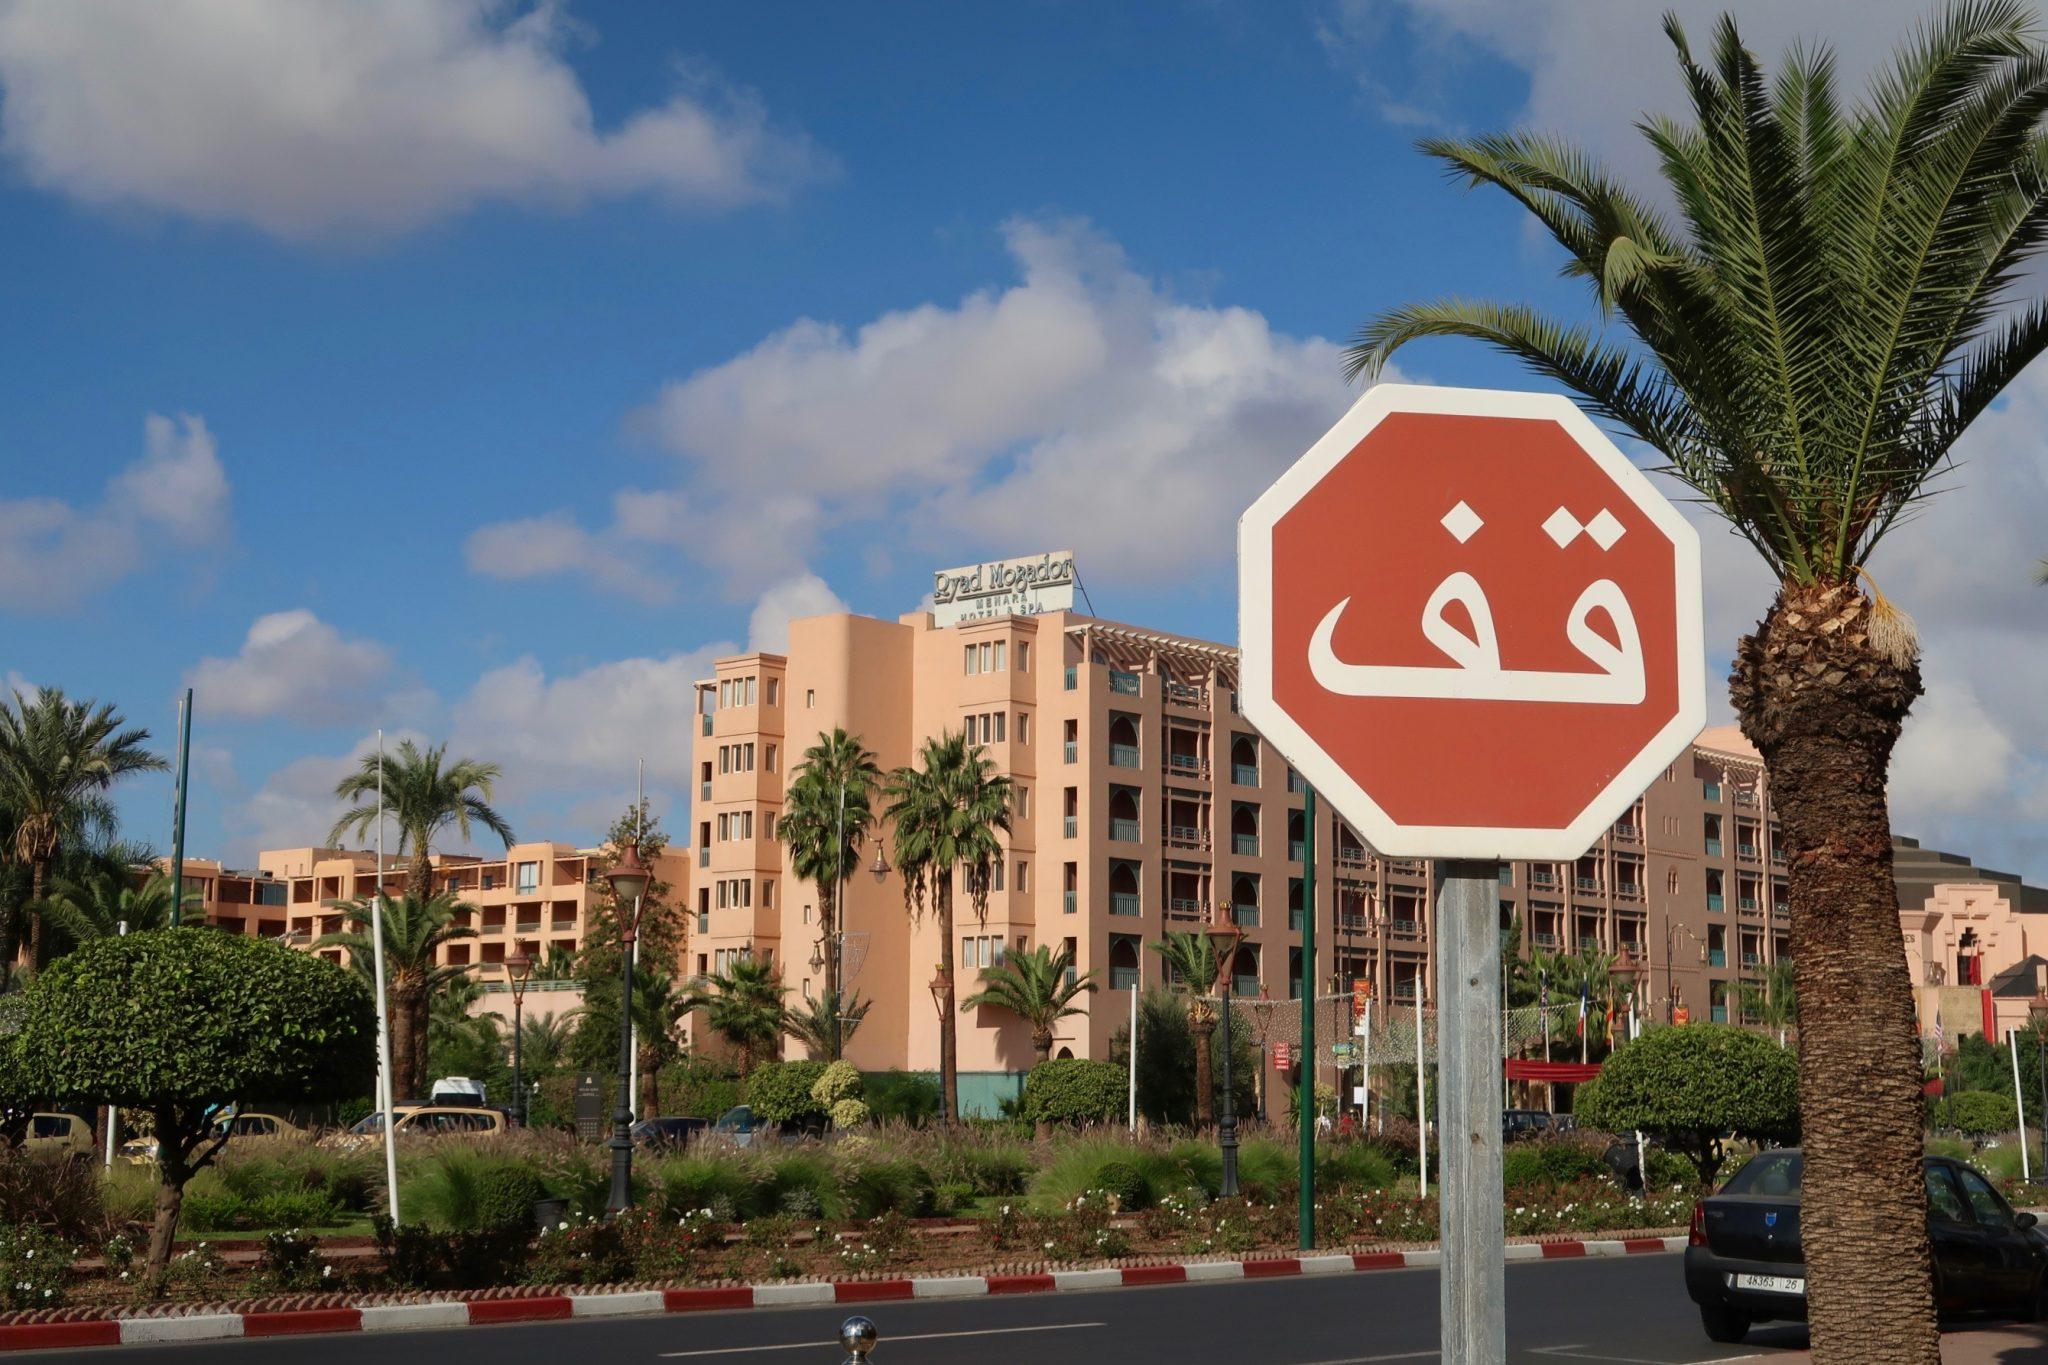 Marrakech liikennemerkki